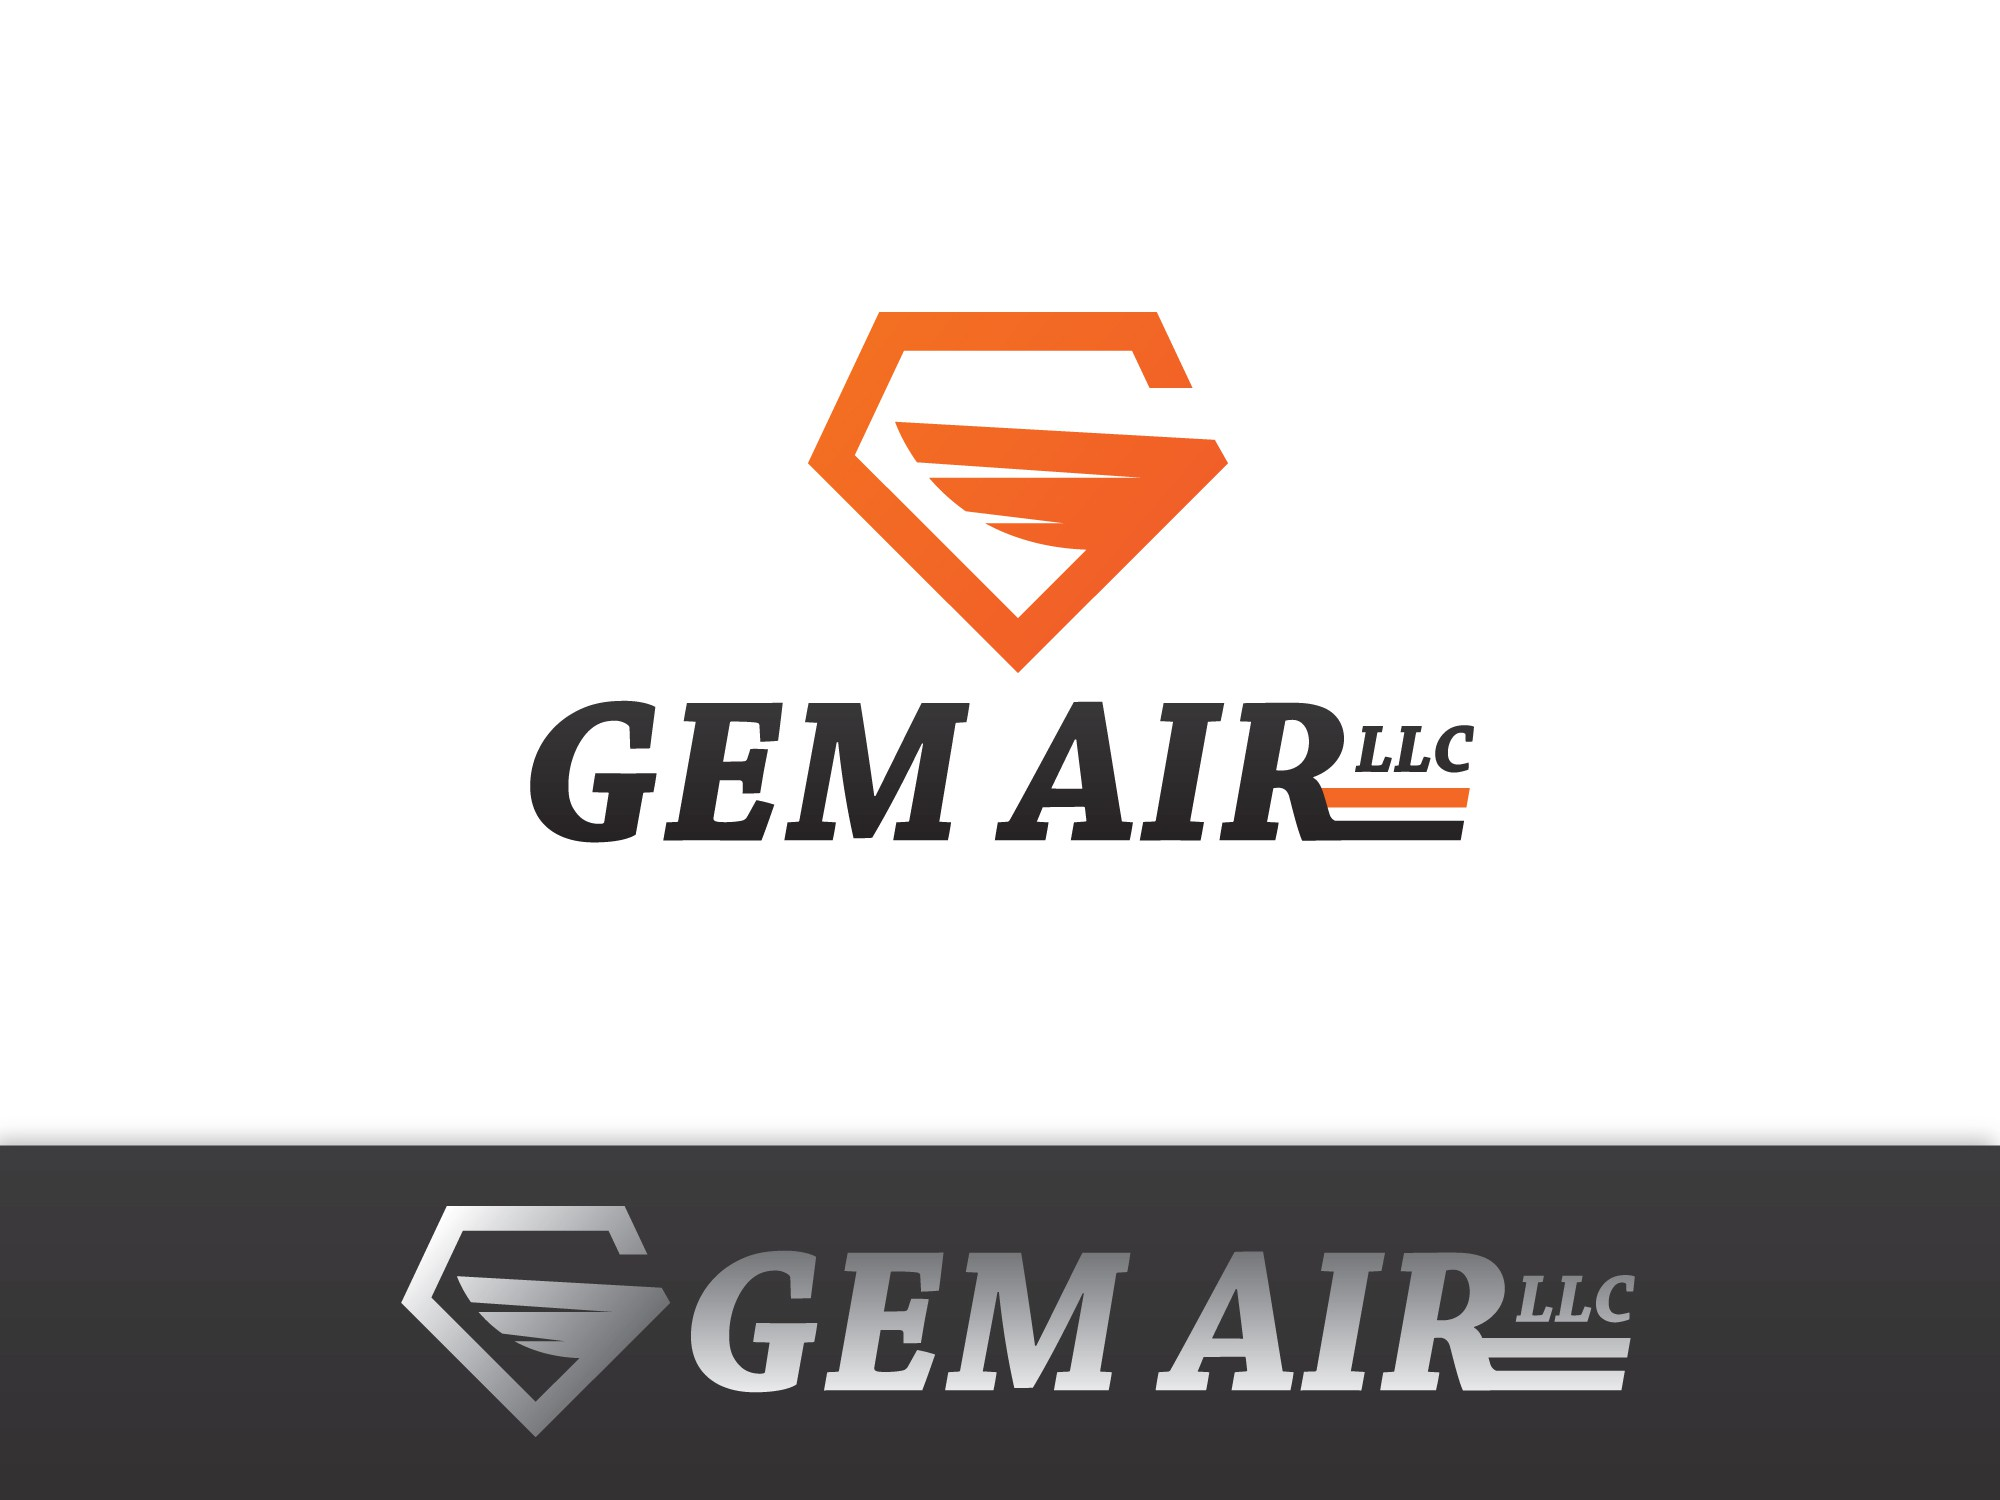 Create a winning logo design for Gem Air, a small airline.